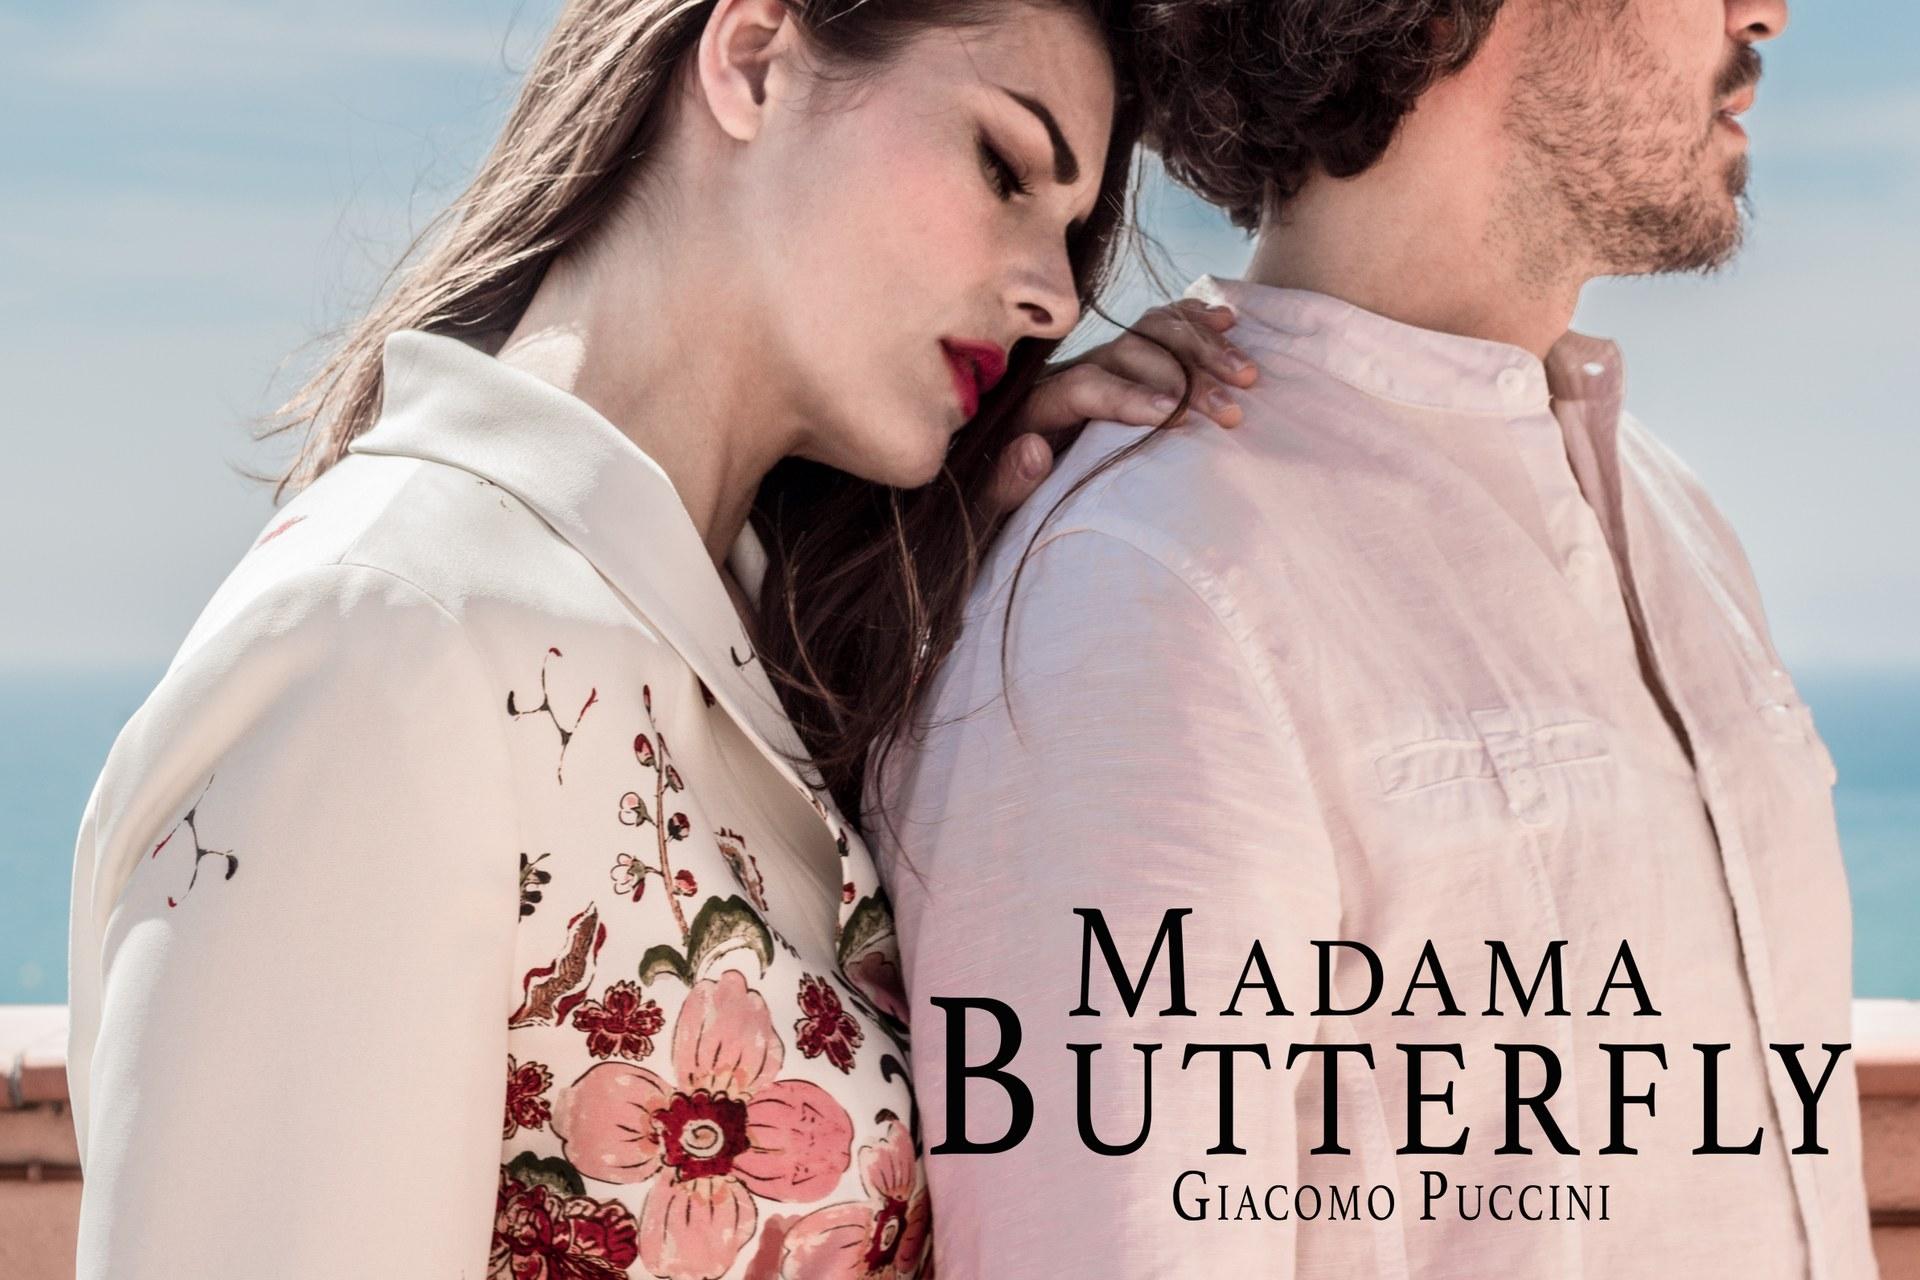 Òpera de butxaca: 'Madama Butterfly' - Sitgestiu 2019